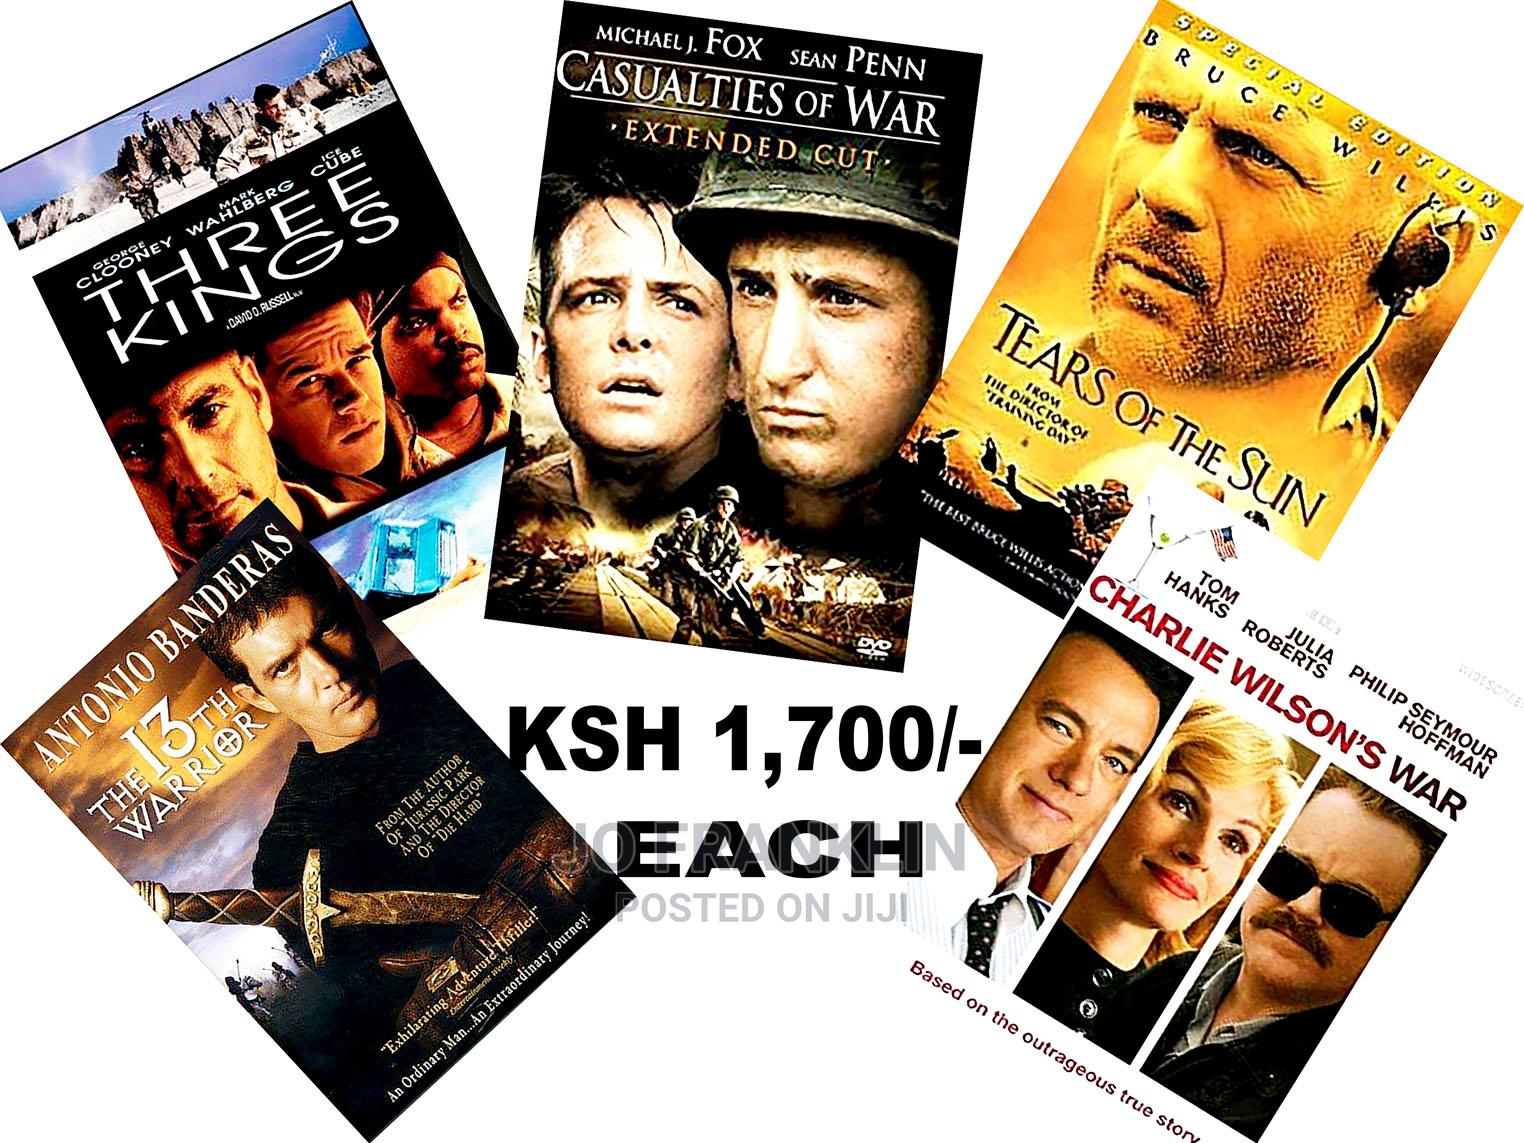 Original Dvd'S for Sale! Almost Brand New! In Original Cases | CDs & DVDs for sale in Lavington, Nairobi, Kenya